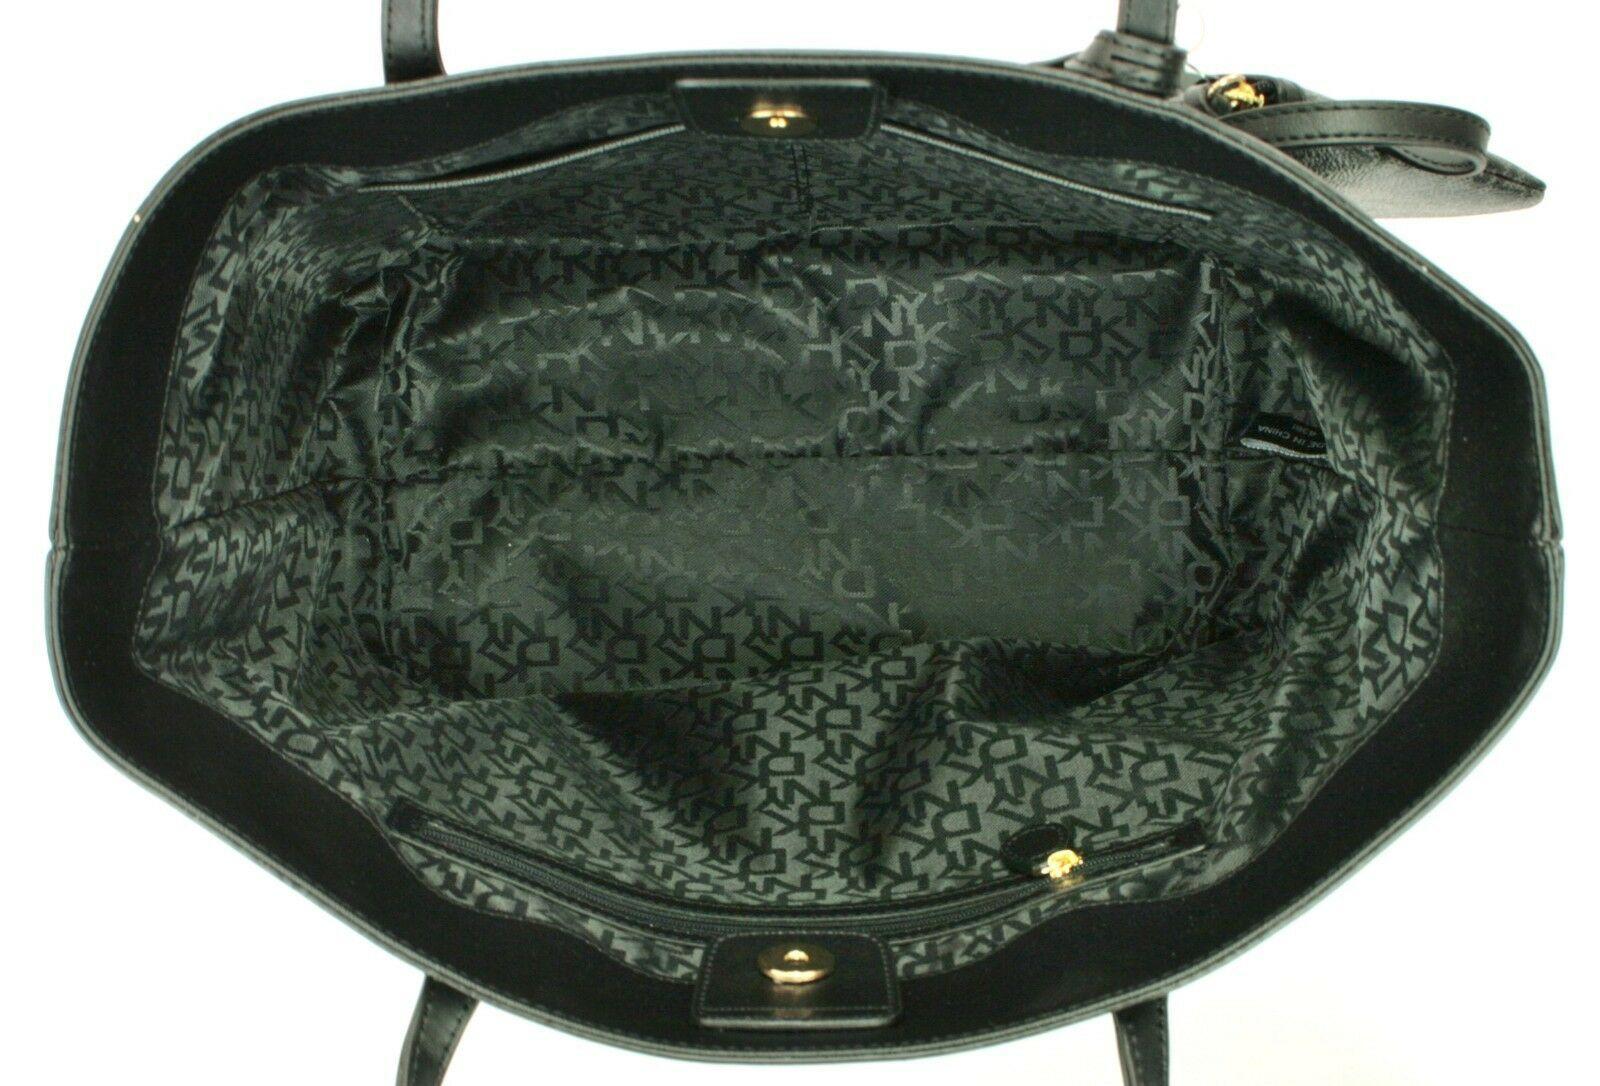 DKNY Donna Karan Heritage Coated Canvas Black Shopper Tote Bag Handbag